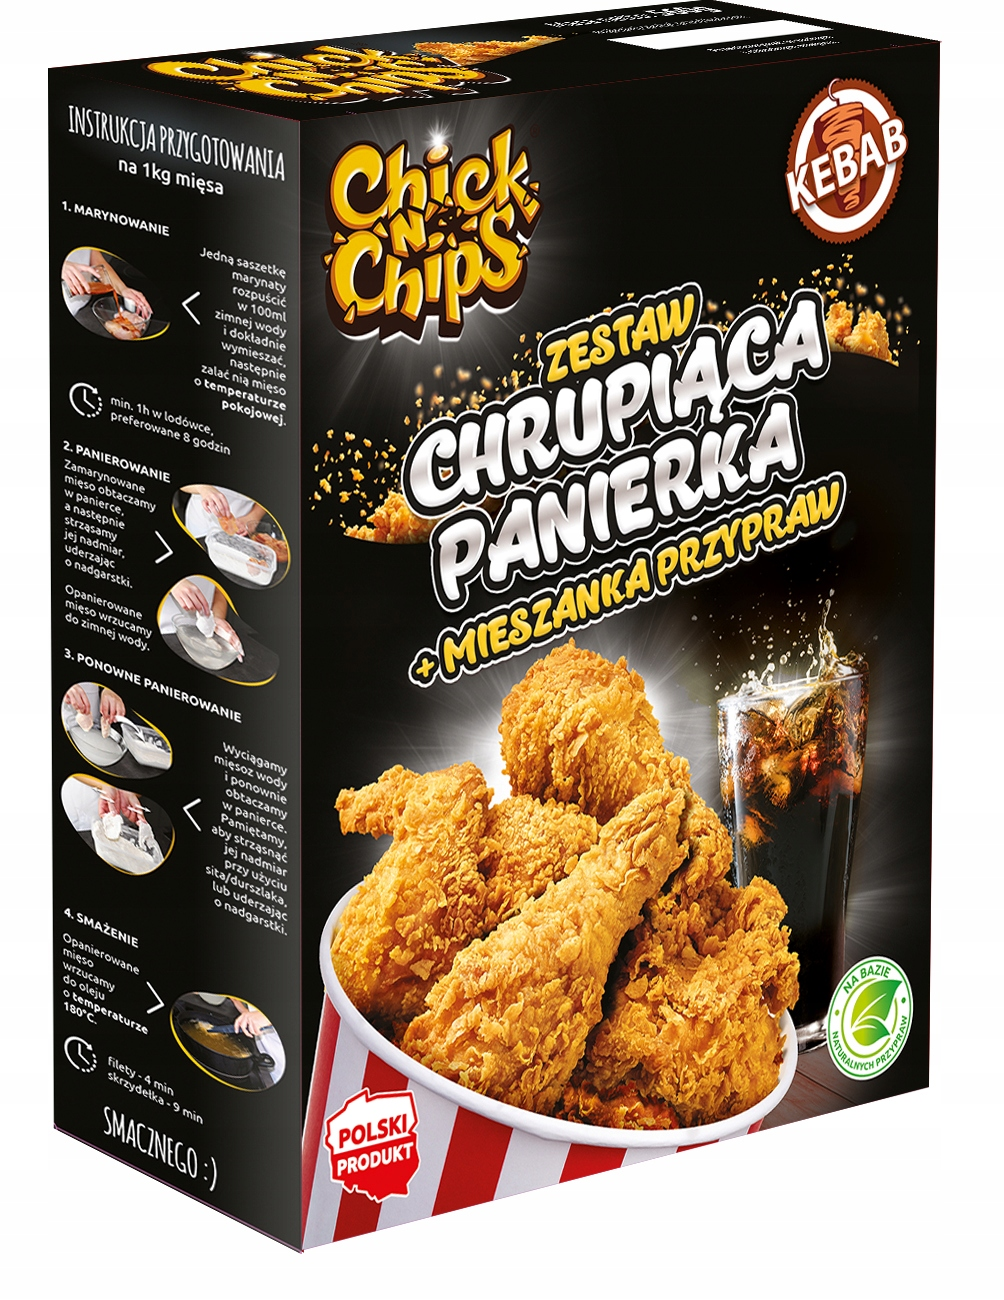 Chick'n'chips домашний KFC + KEBAB - GYROS